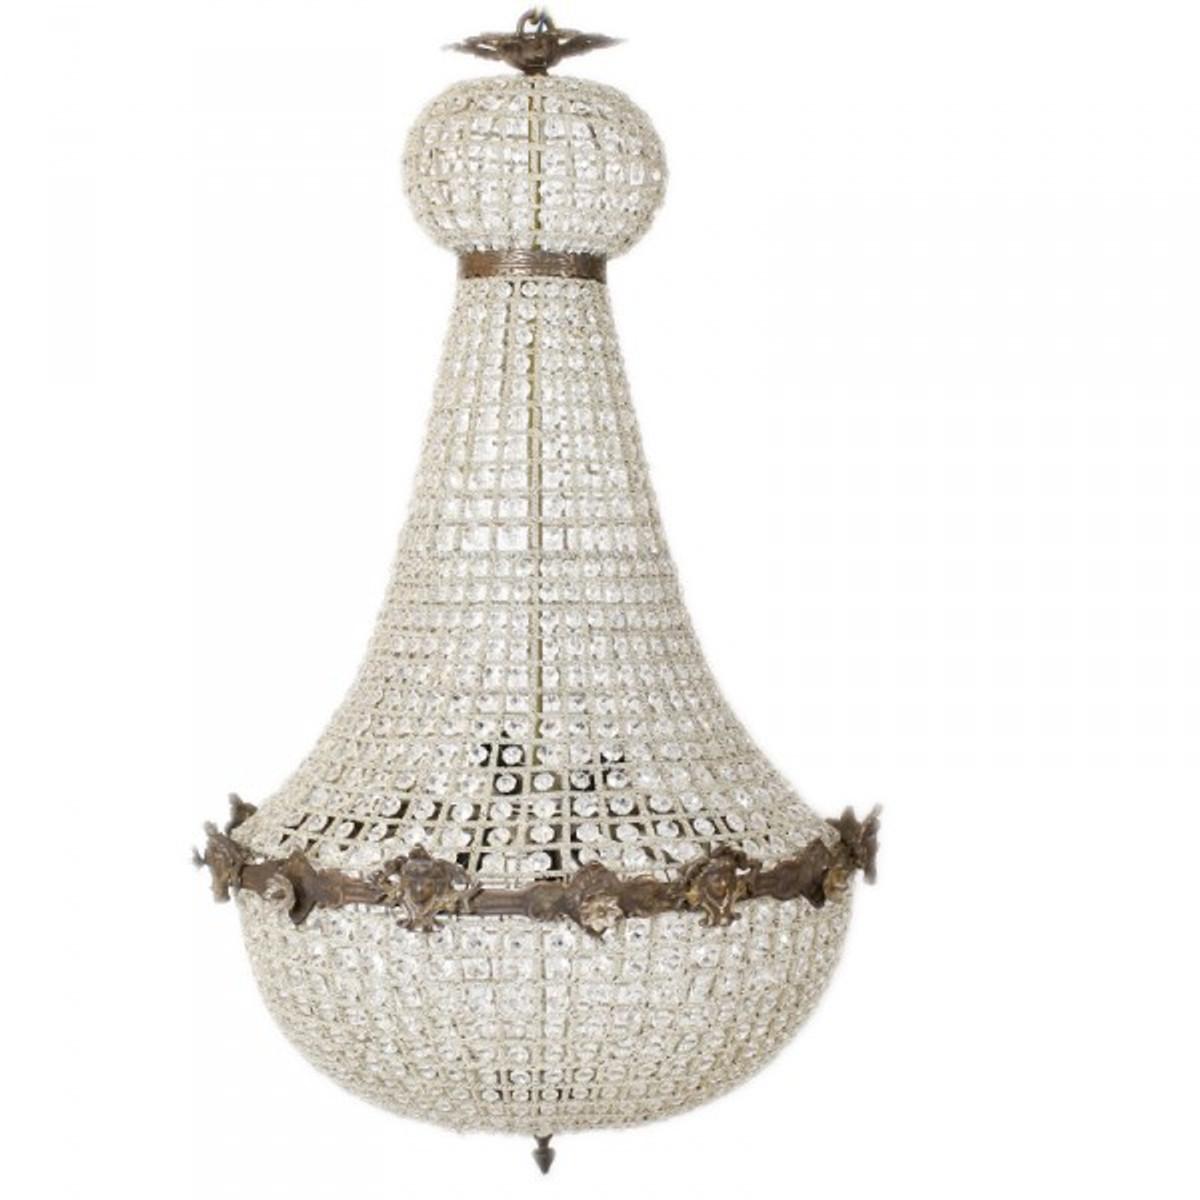 casa padrino luxus barock decken h ngeleuchte 60 x h 110 cm glas oxide leuchten l ster. Black Bedroom Furniture Sets. Home Design Ideas